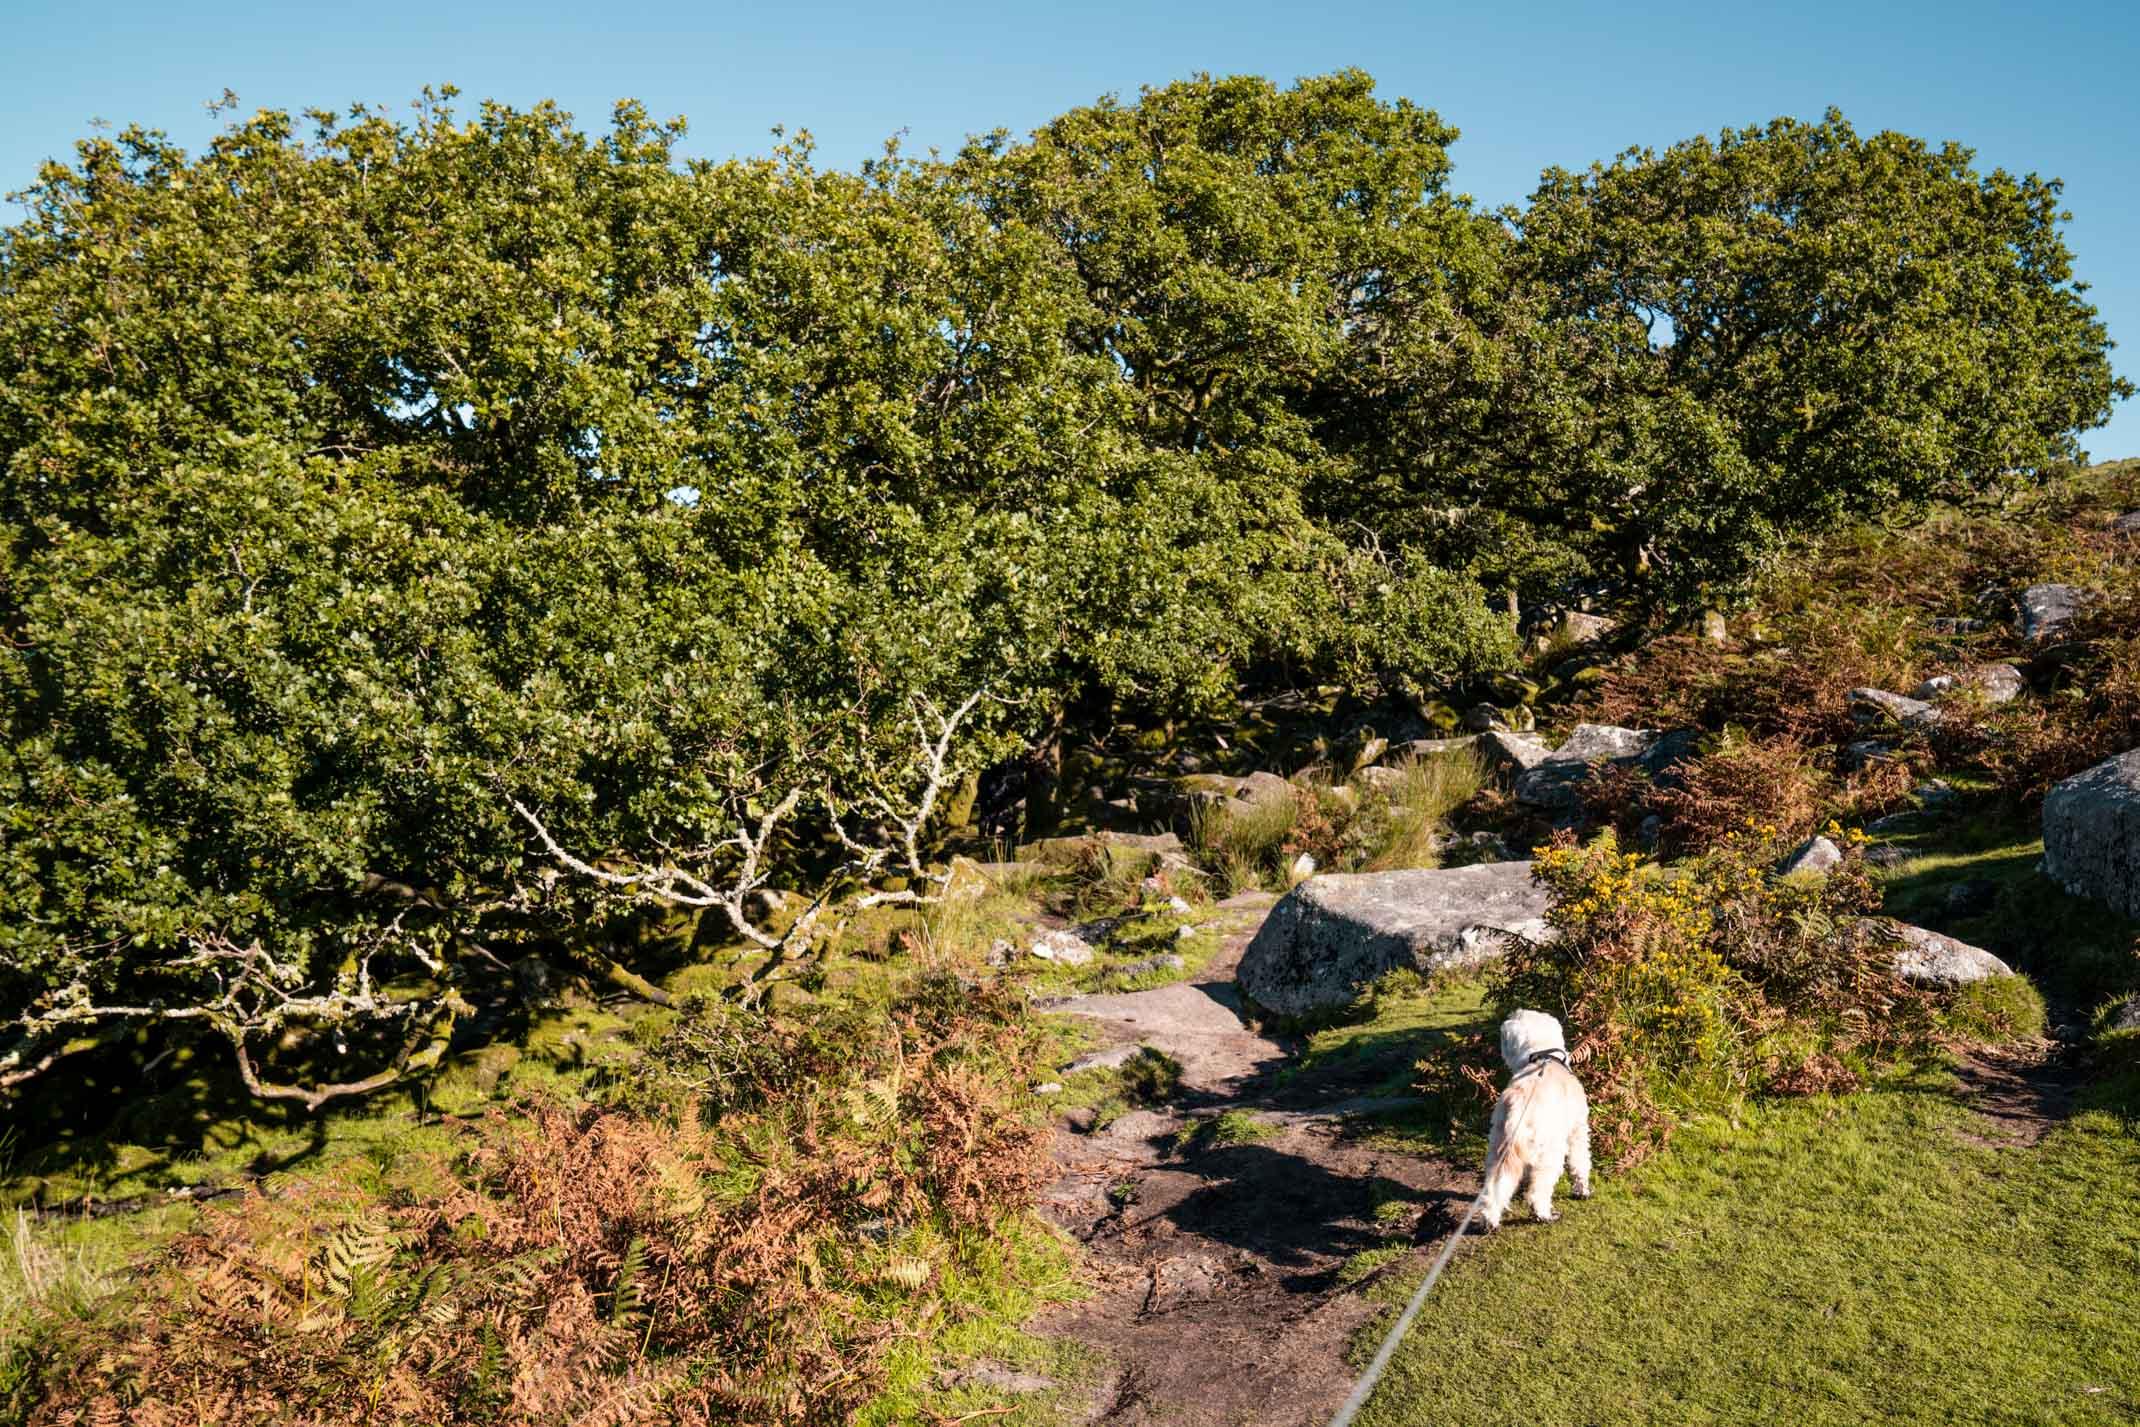 A guide to exploring Dartmoor National Park, Devon